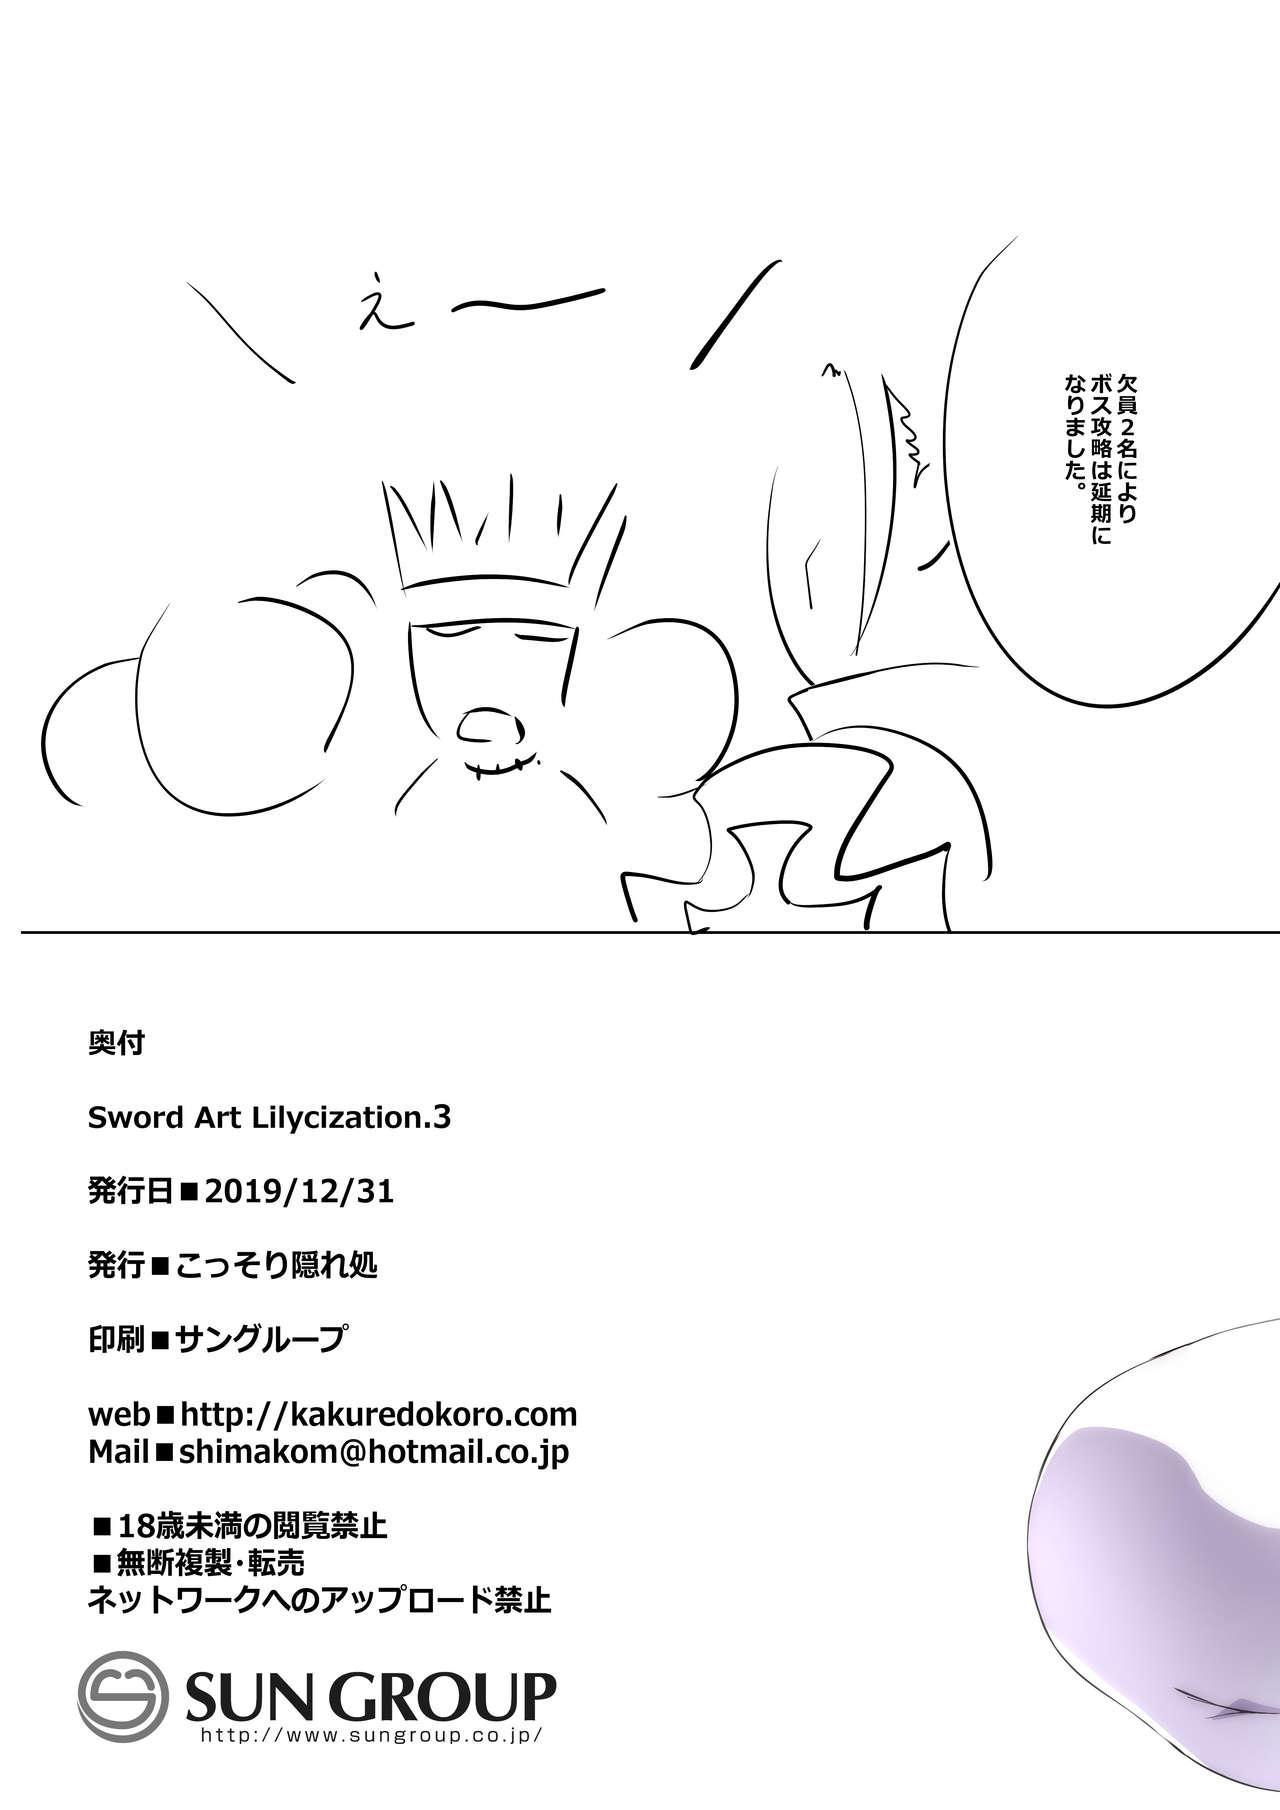 Sword Art Lilycization.3 18